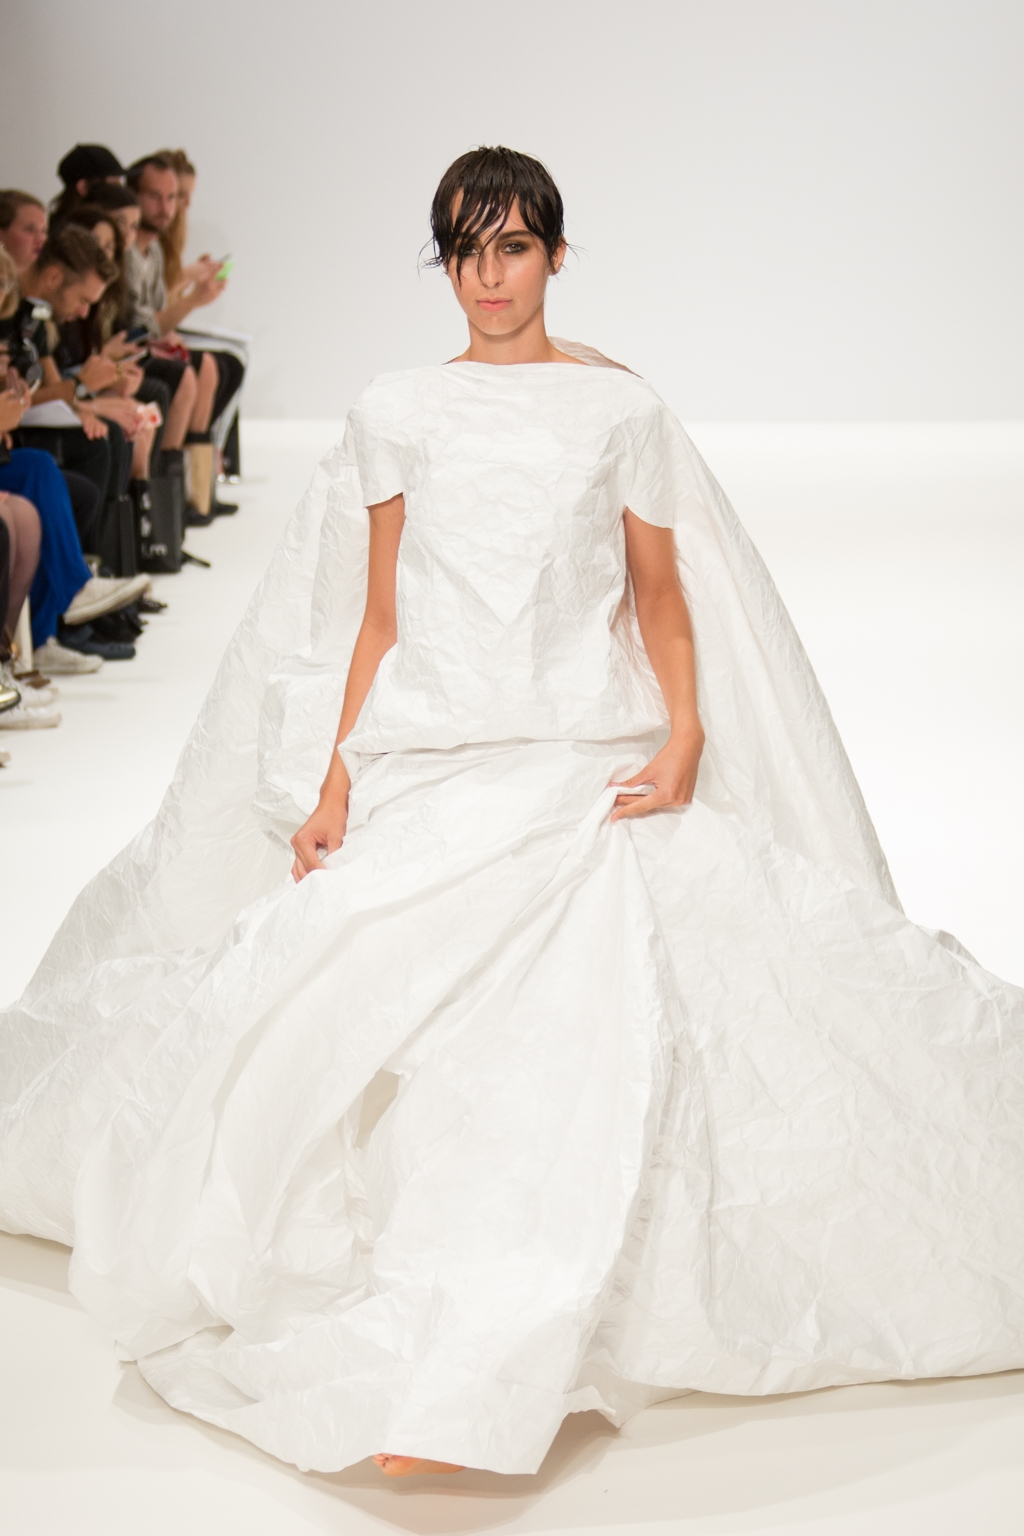 lfw-ss17-swedish-school-of-textiles-erol-birsen-the-upcoming-1-1